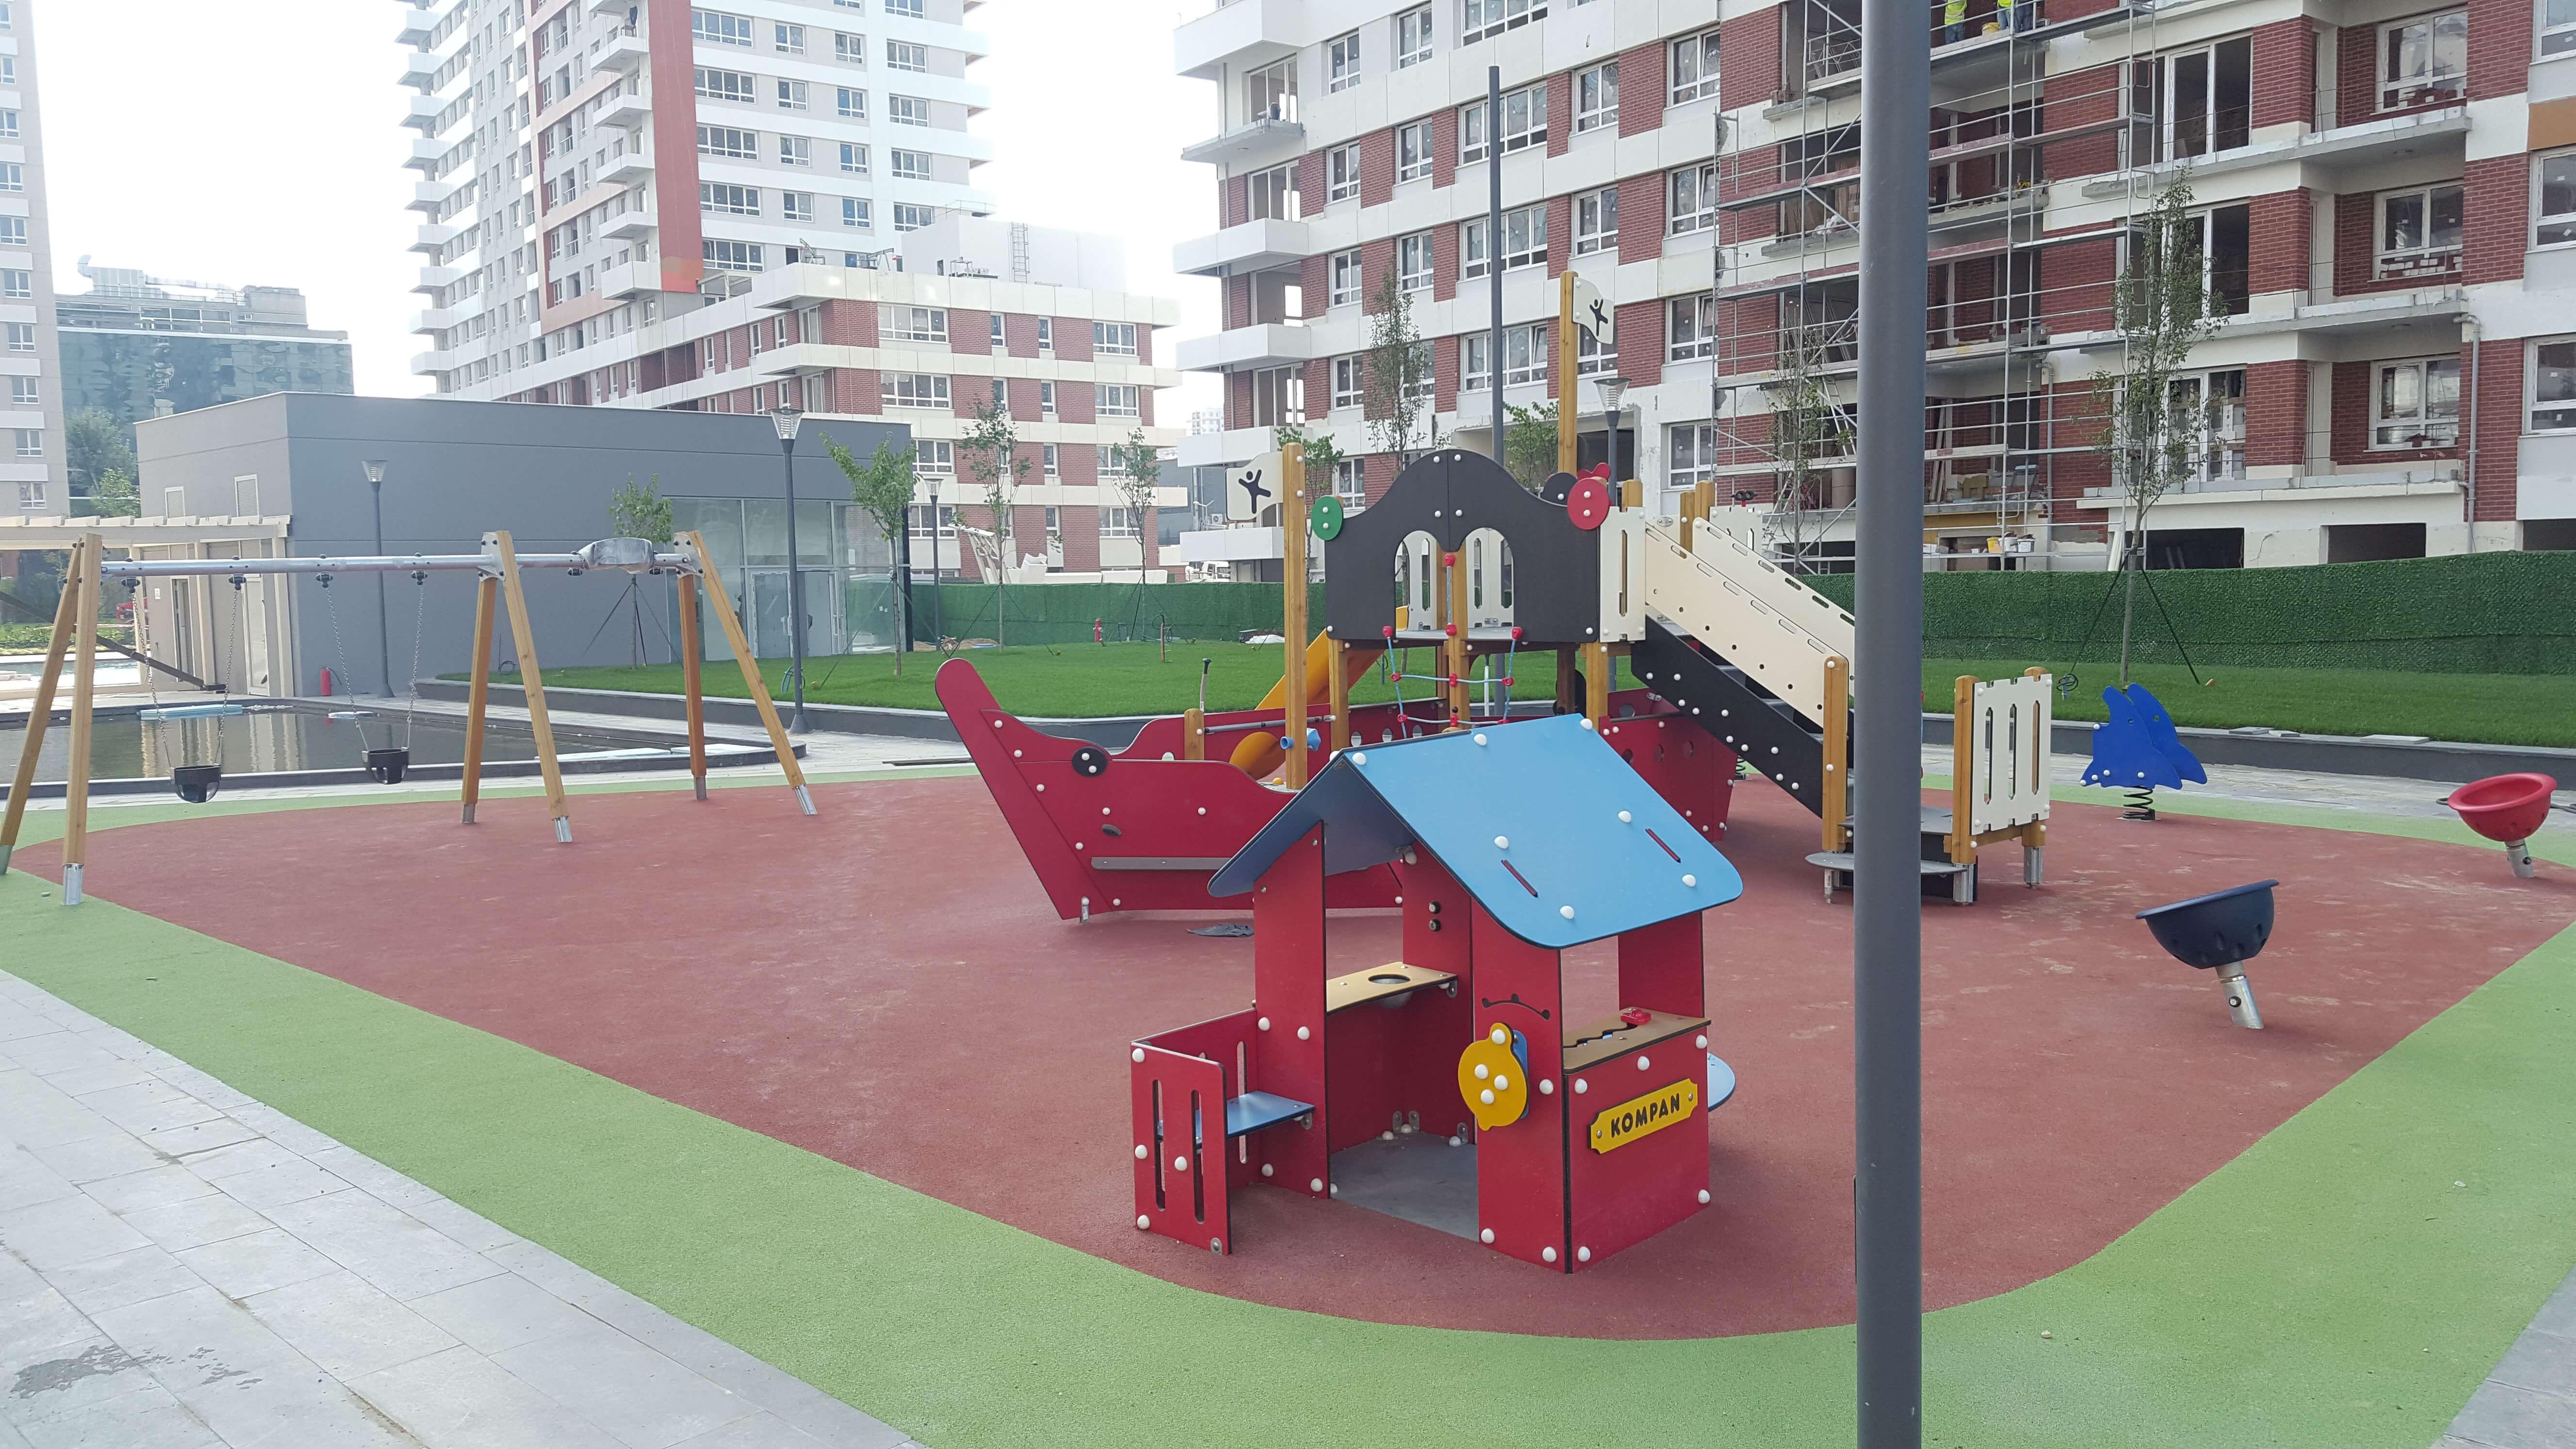 Nurol Park İstanbul Çocuk Parkı